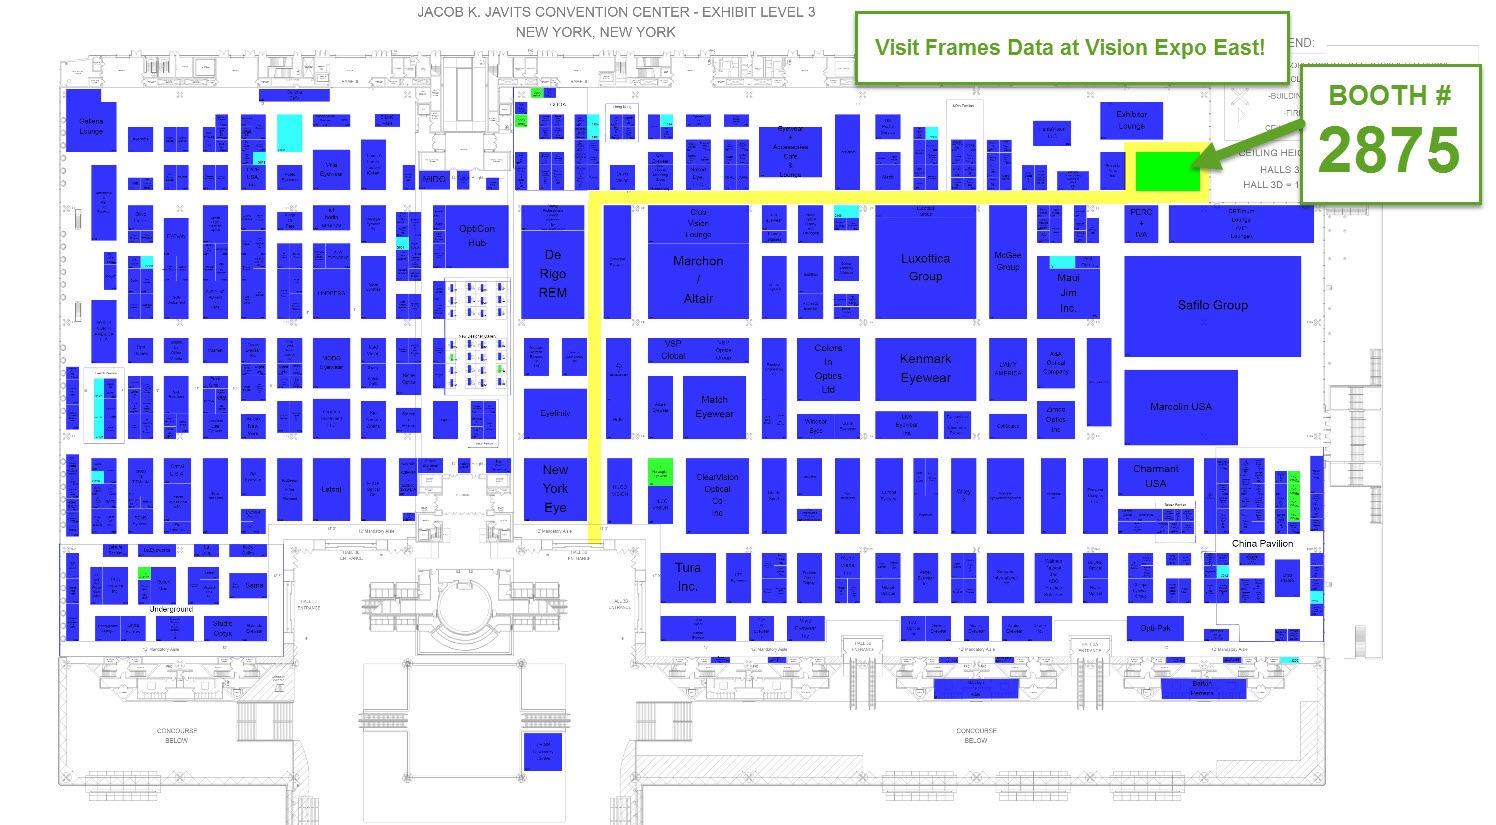 Visit Frames Data at Vision Expo Booth #2875